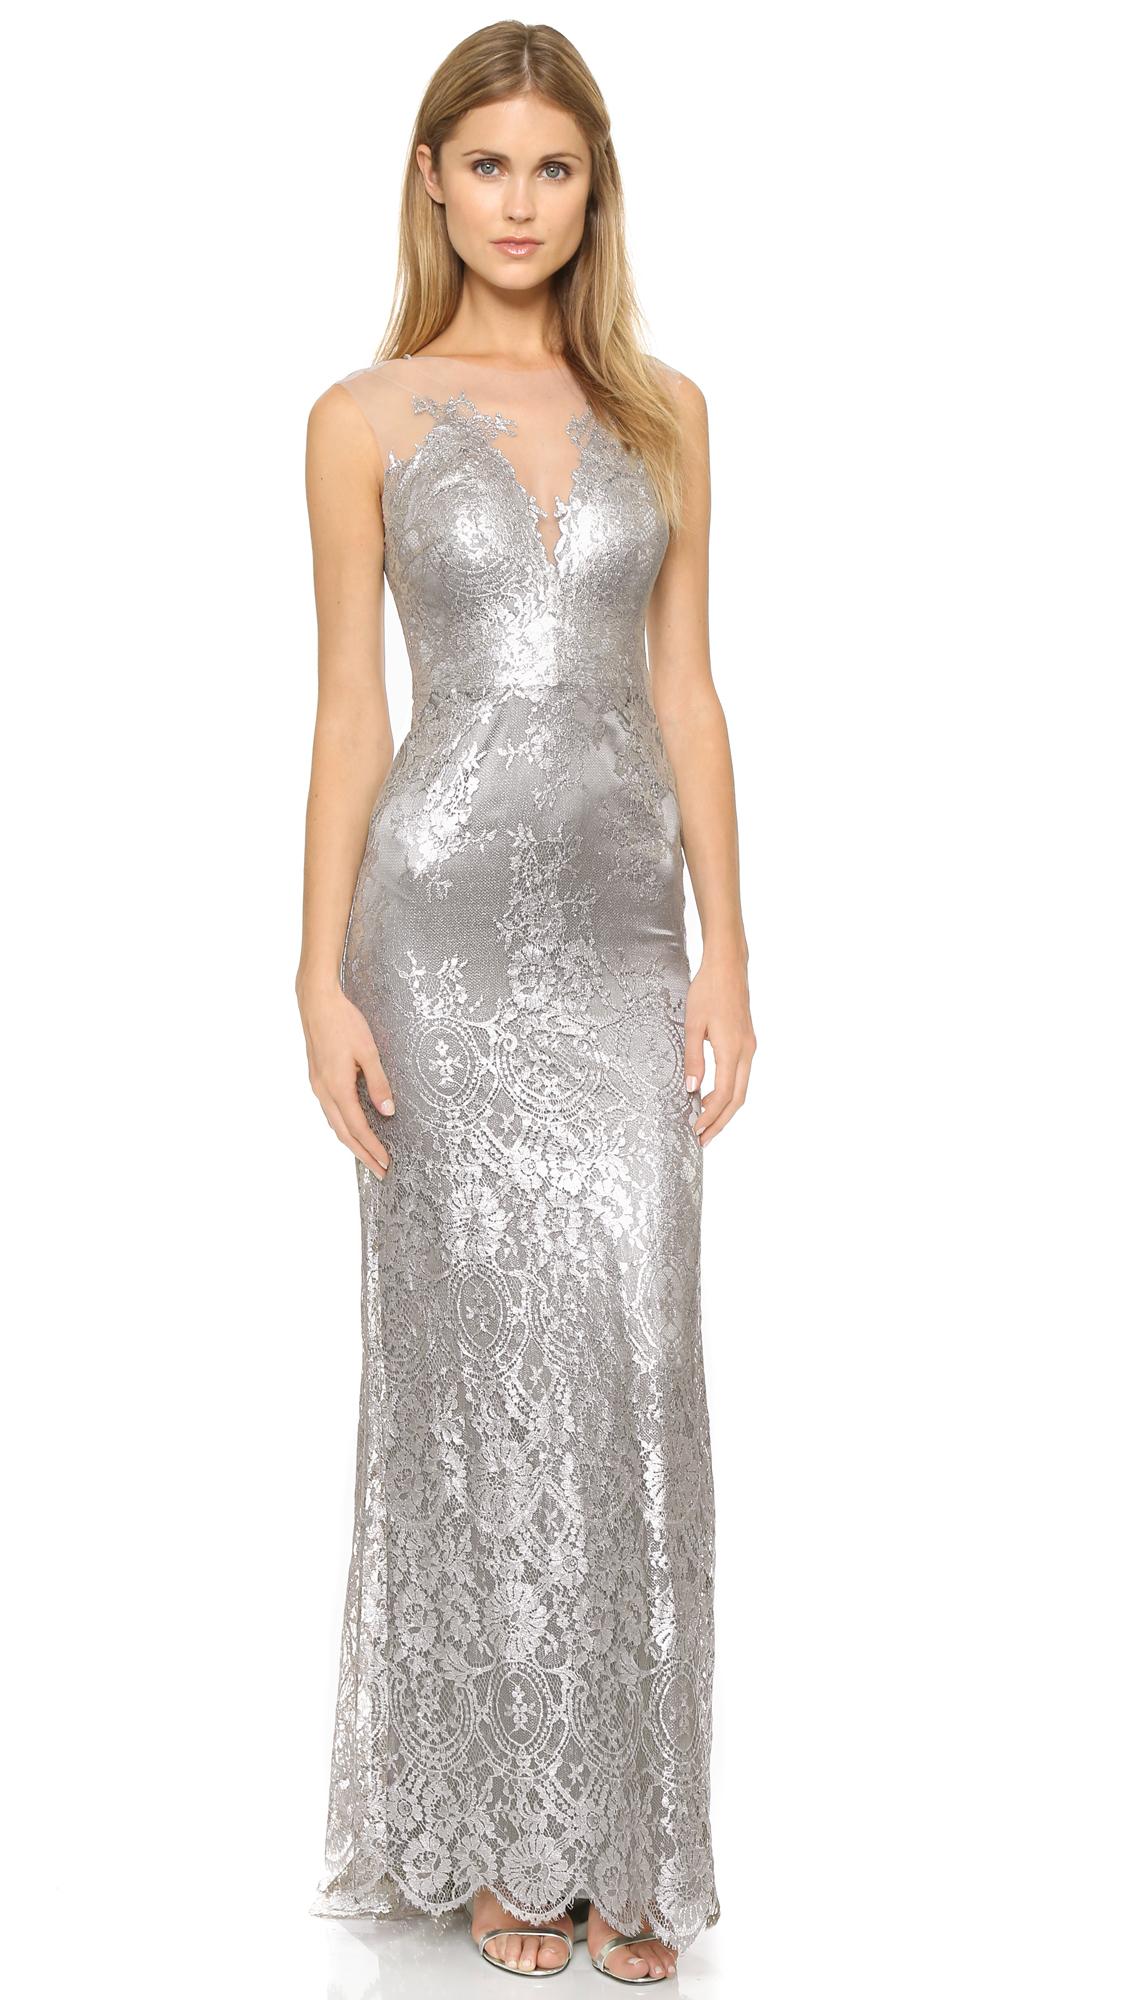 Lyst - Catherine Deane Chloe Metallic Lace Gown - Metallic Silver ...